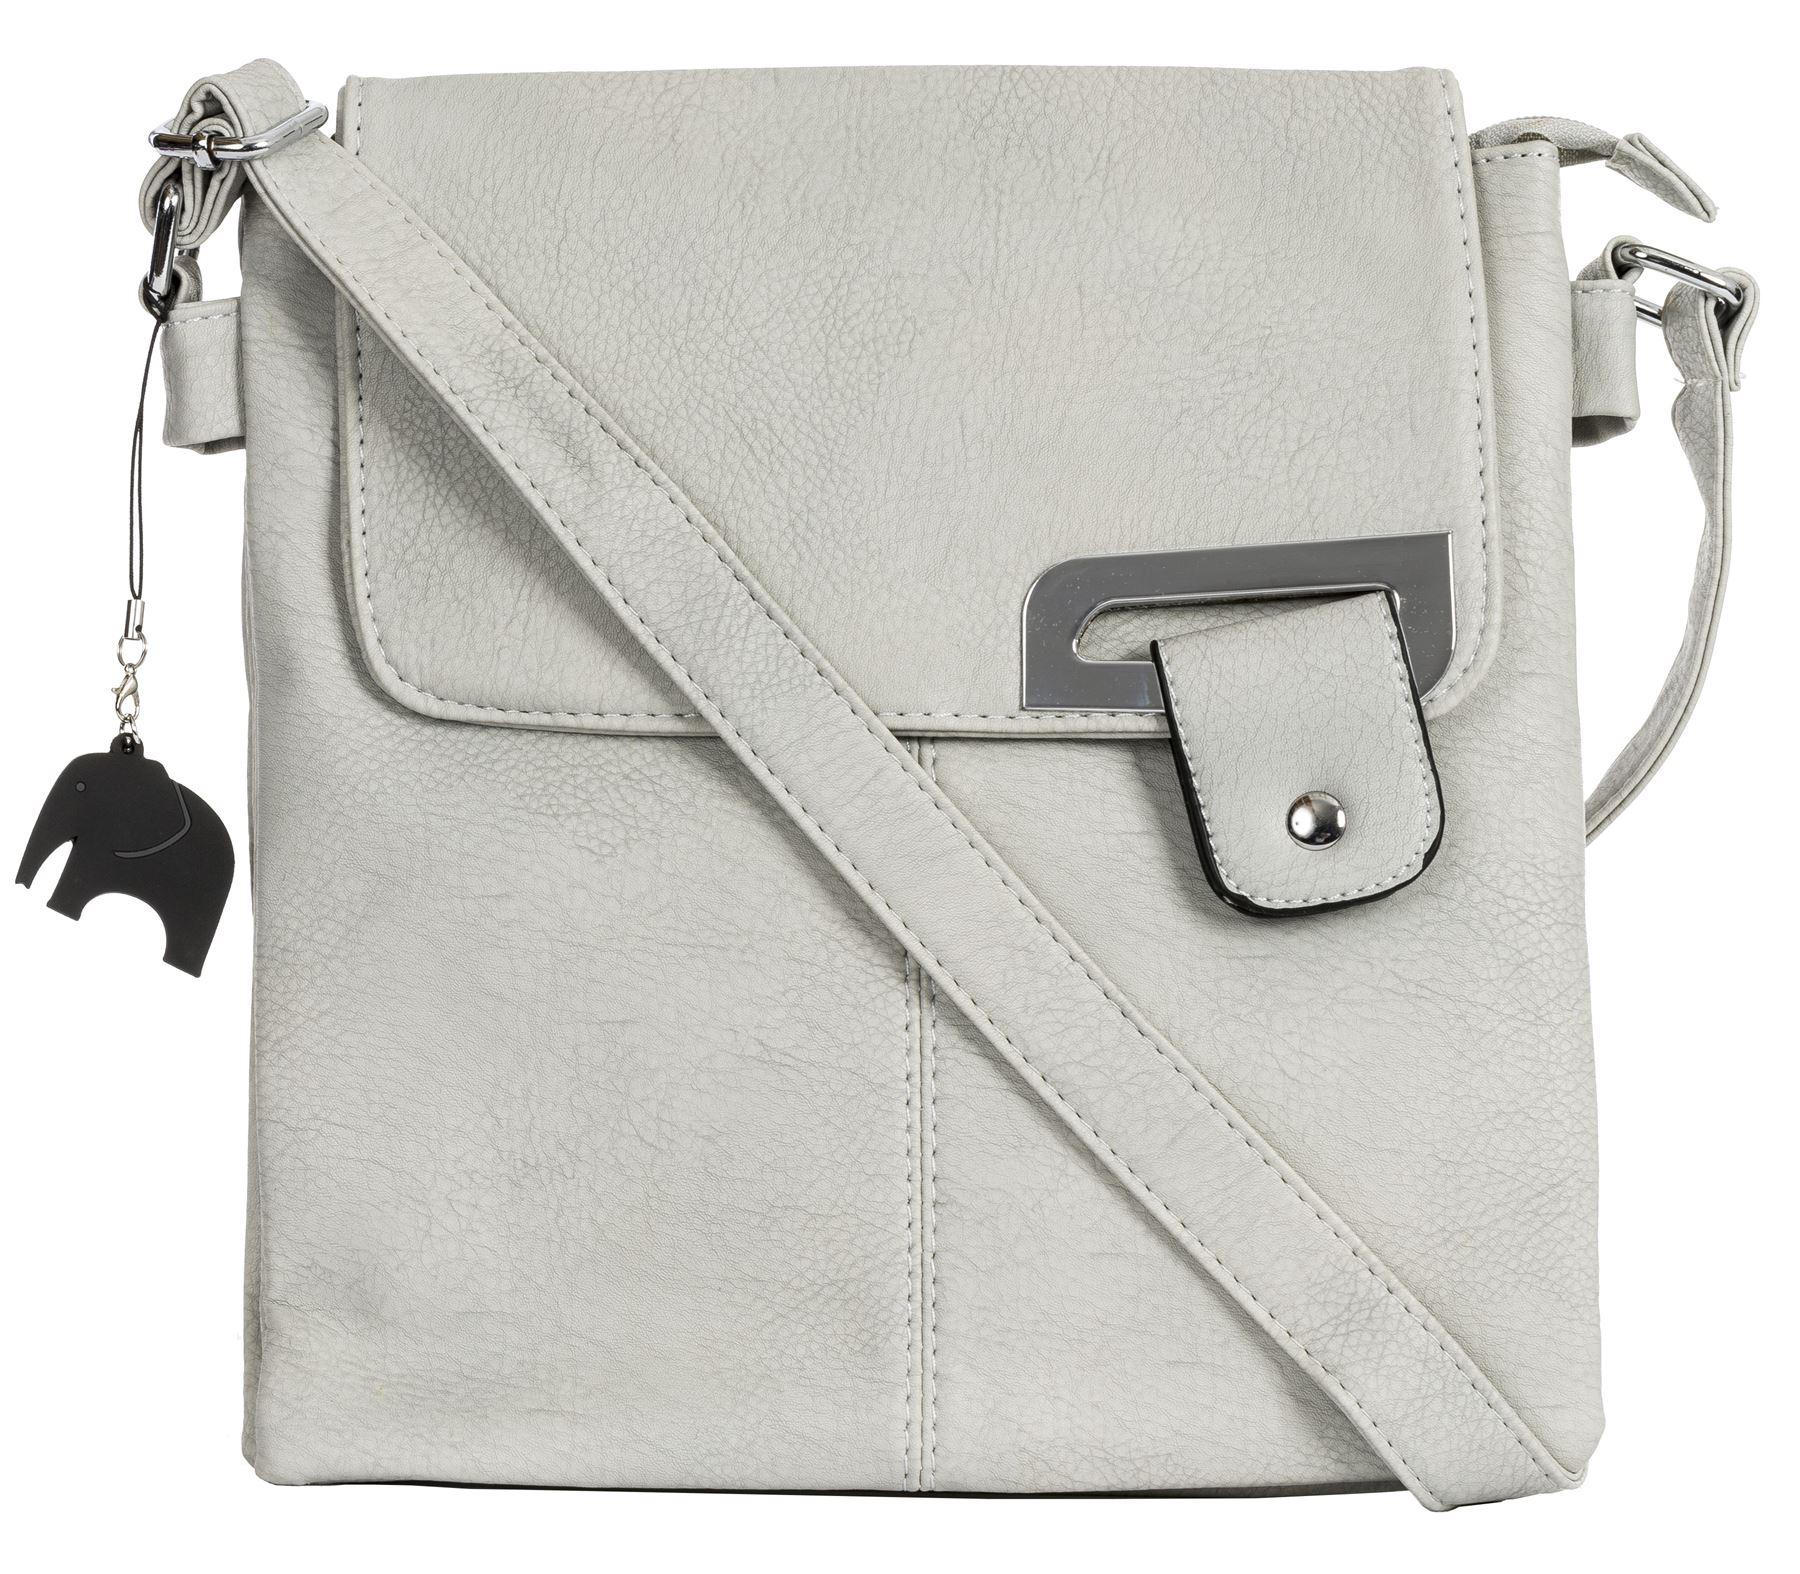 Big Handbag Shop Womens Medium Trendy Messenger Cross Body Shoulder Bag